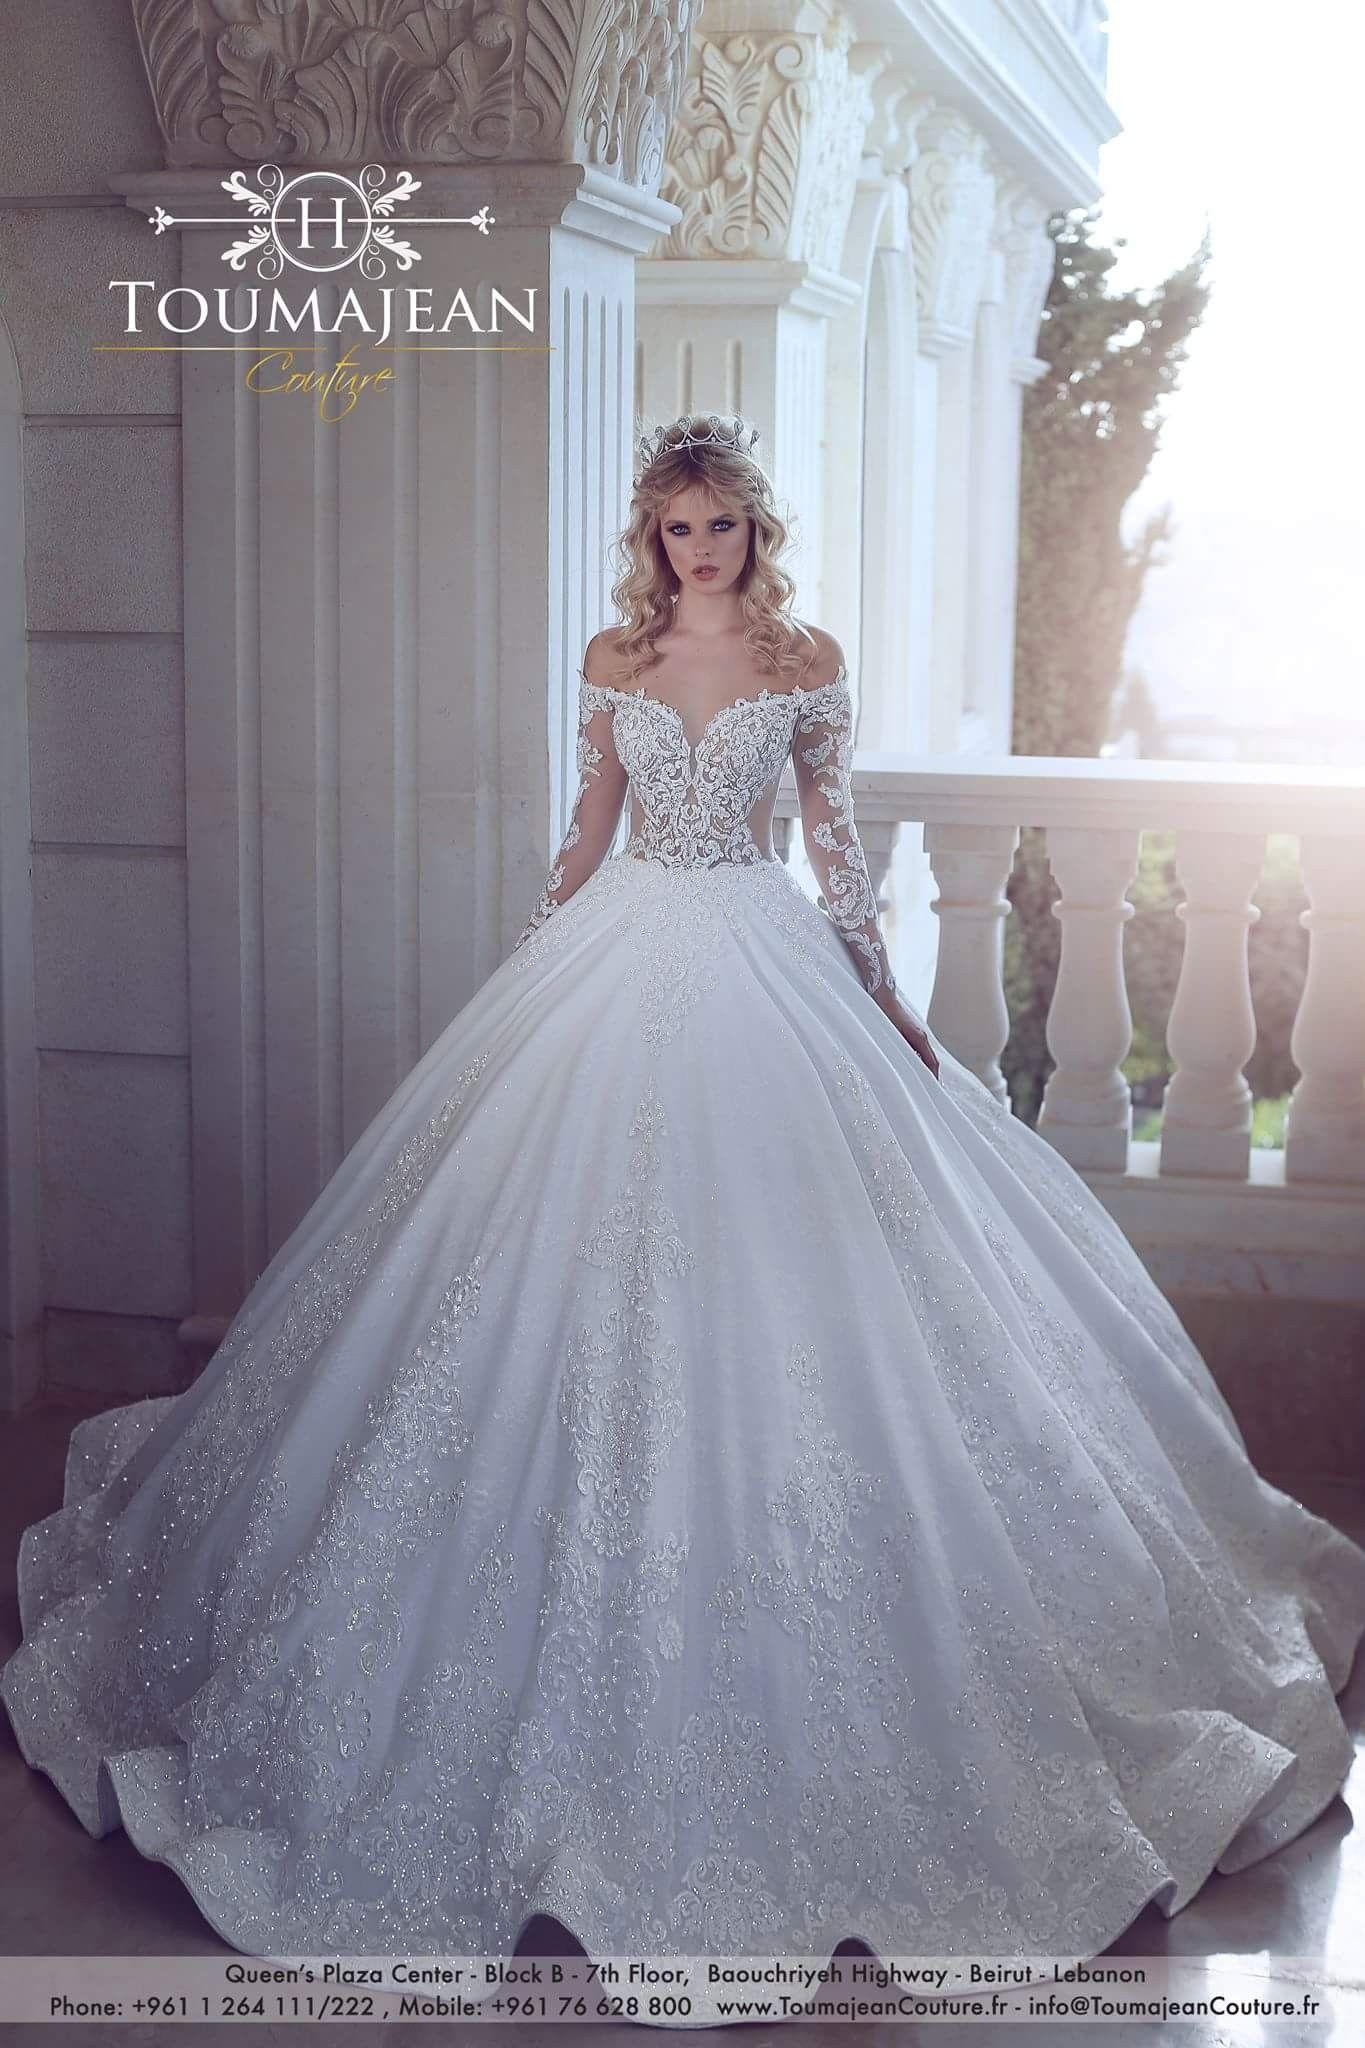 Wedding Dress Princess Princess Wedding Dresses Dream Wedding Dresses Ball Gowns Wedding [ 2048 x 1365 Pixel ]